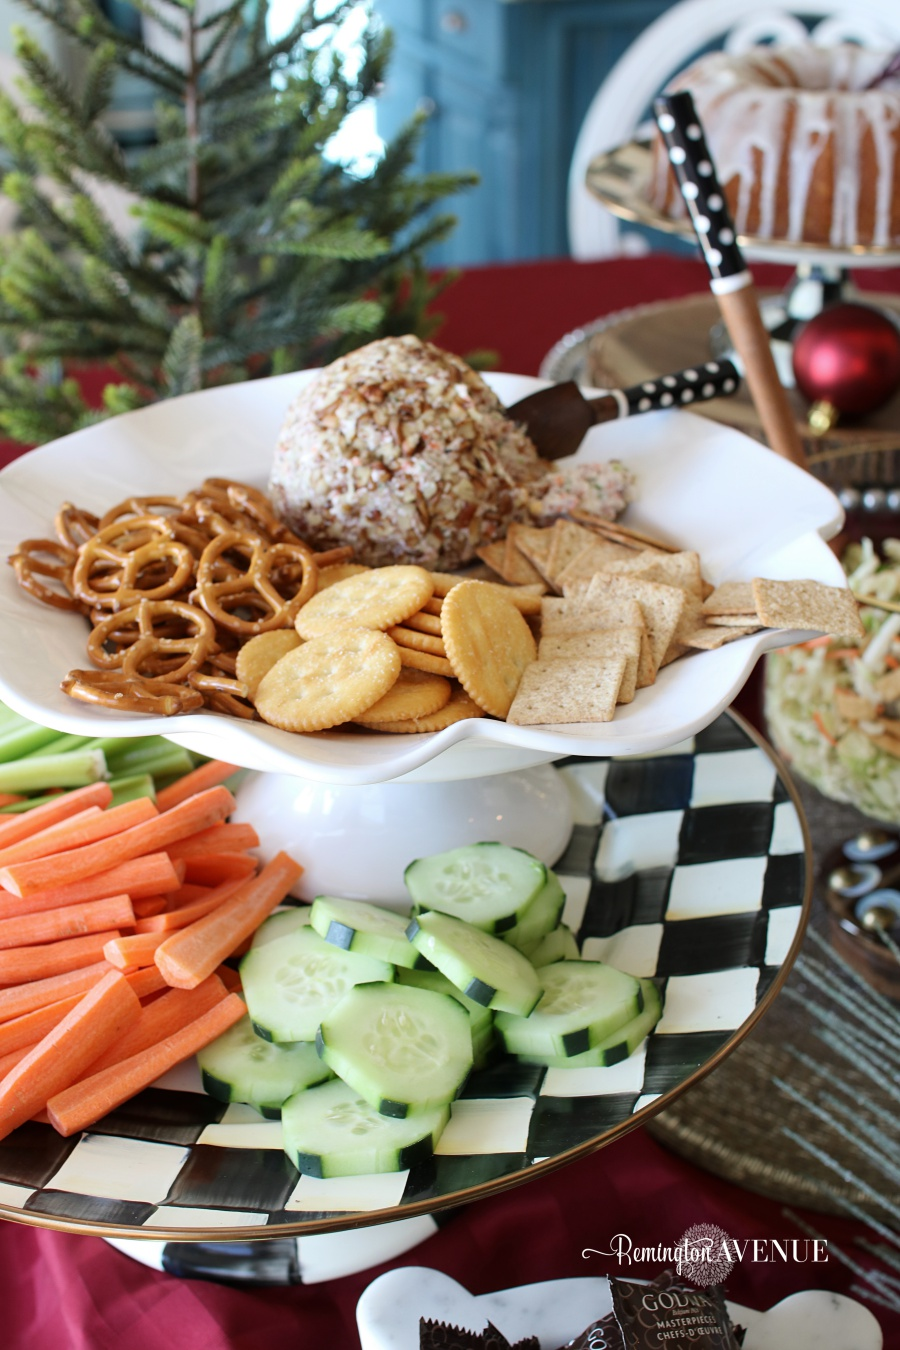 Creamy Cheeseball - Secret family recipe revealed